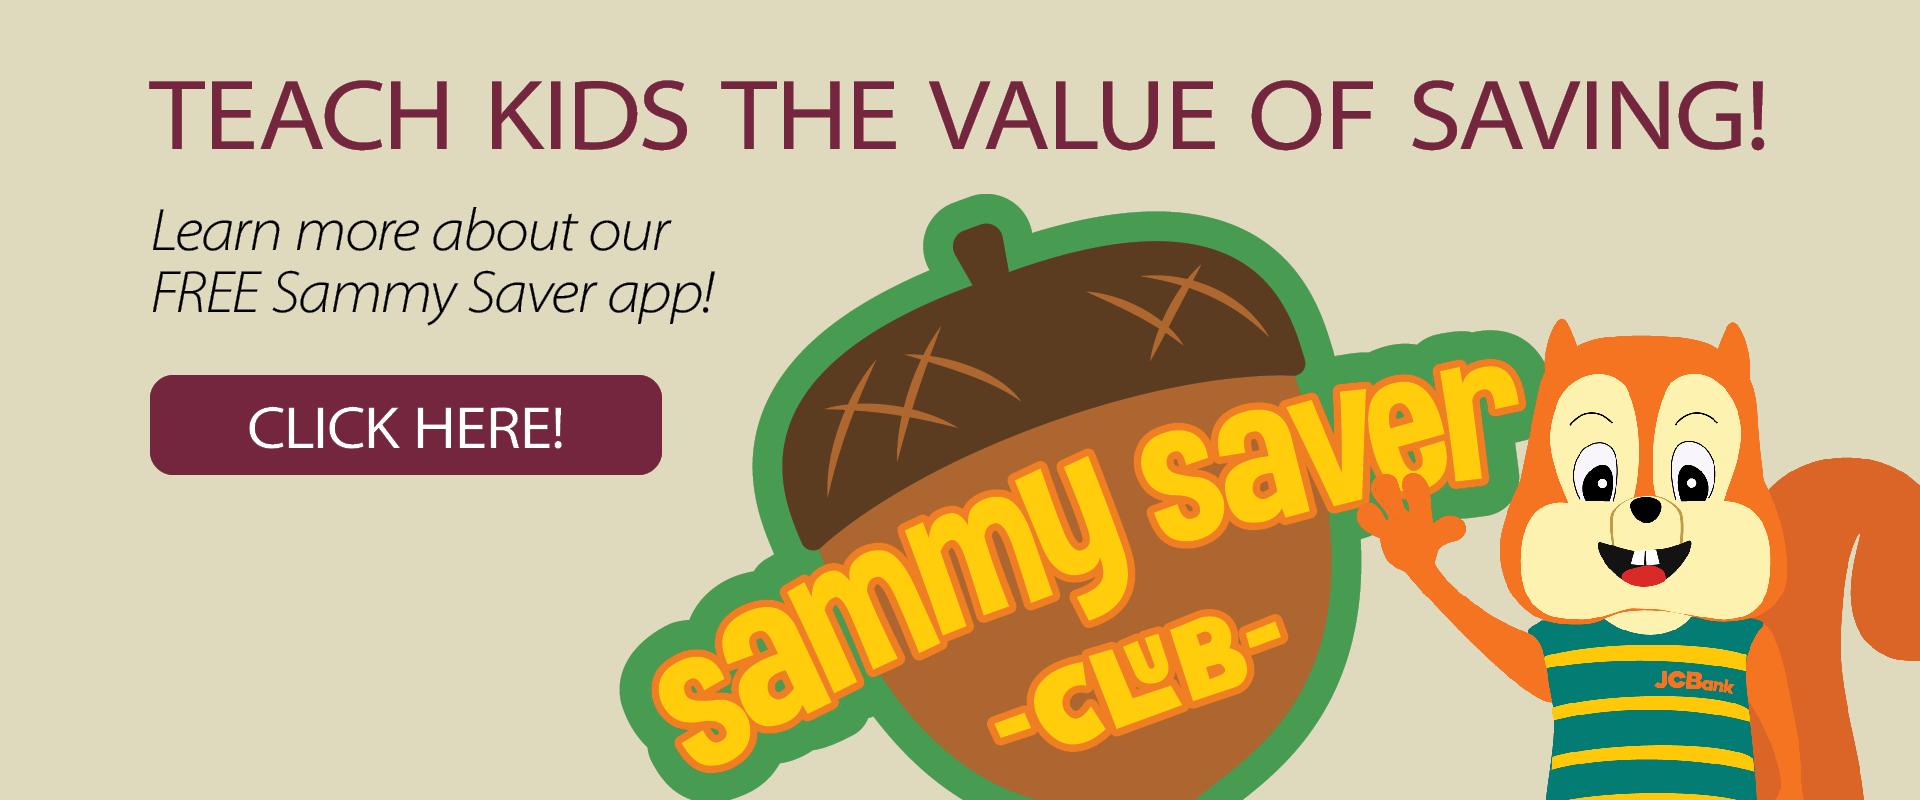 Teach kids to save with the Sammy Saver app!